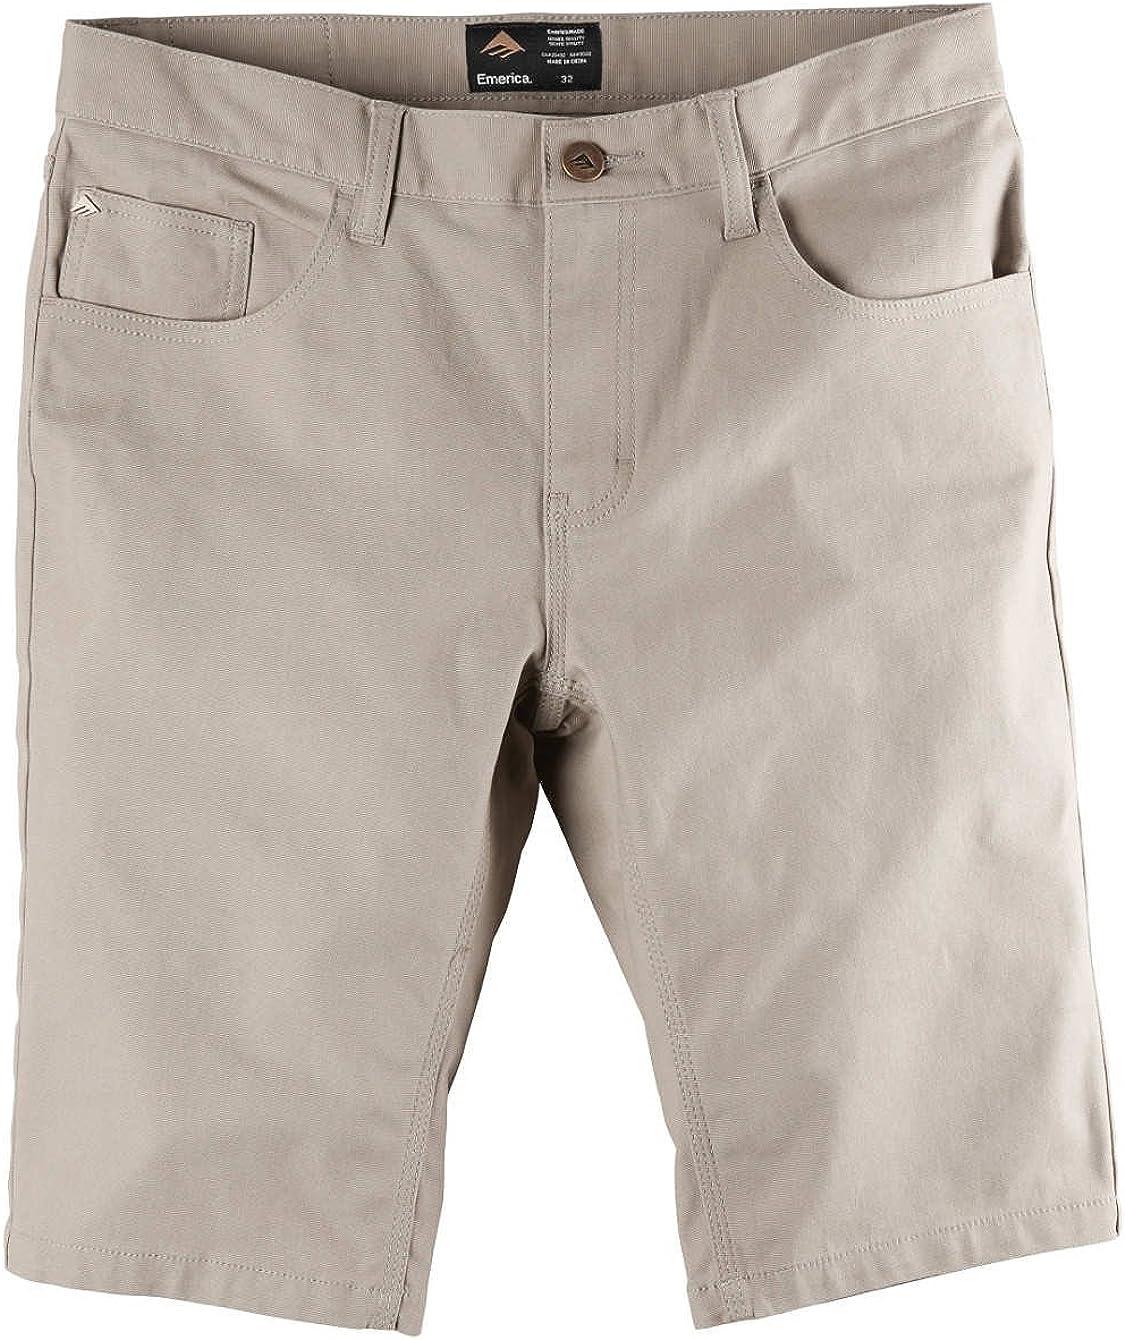 Emerica 6130002494 Mens Pure 5 Pocket Short